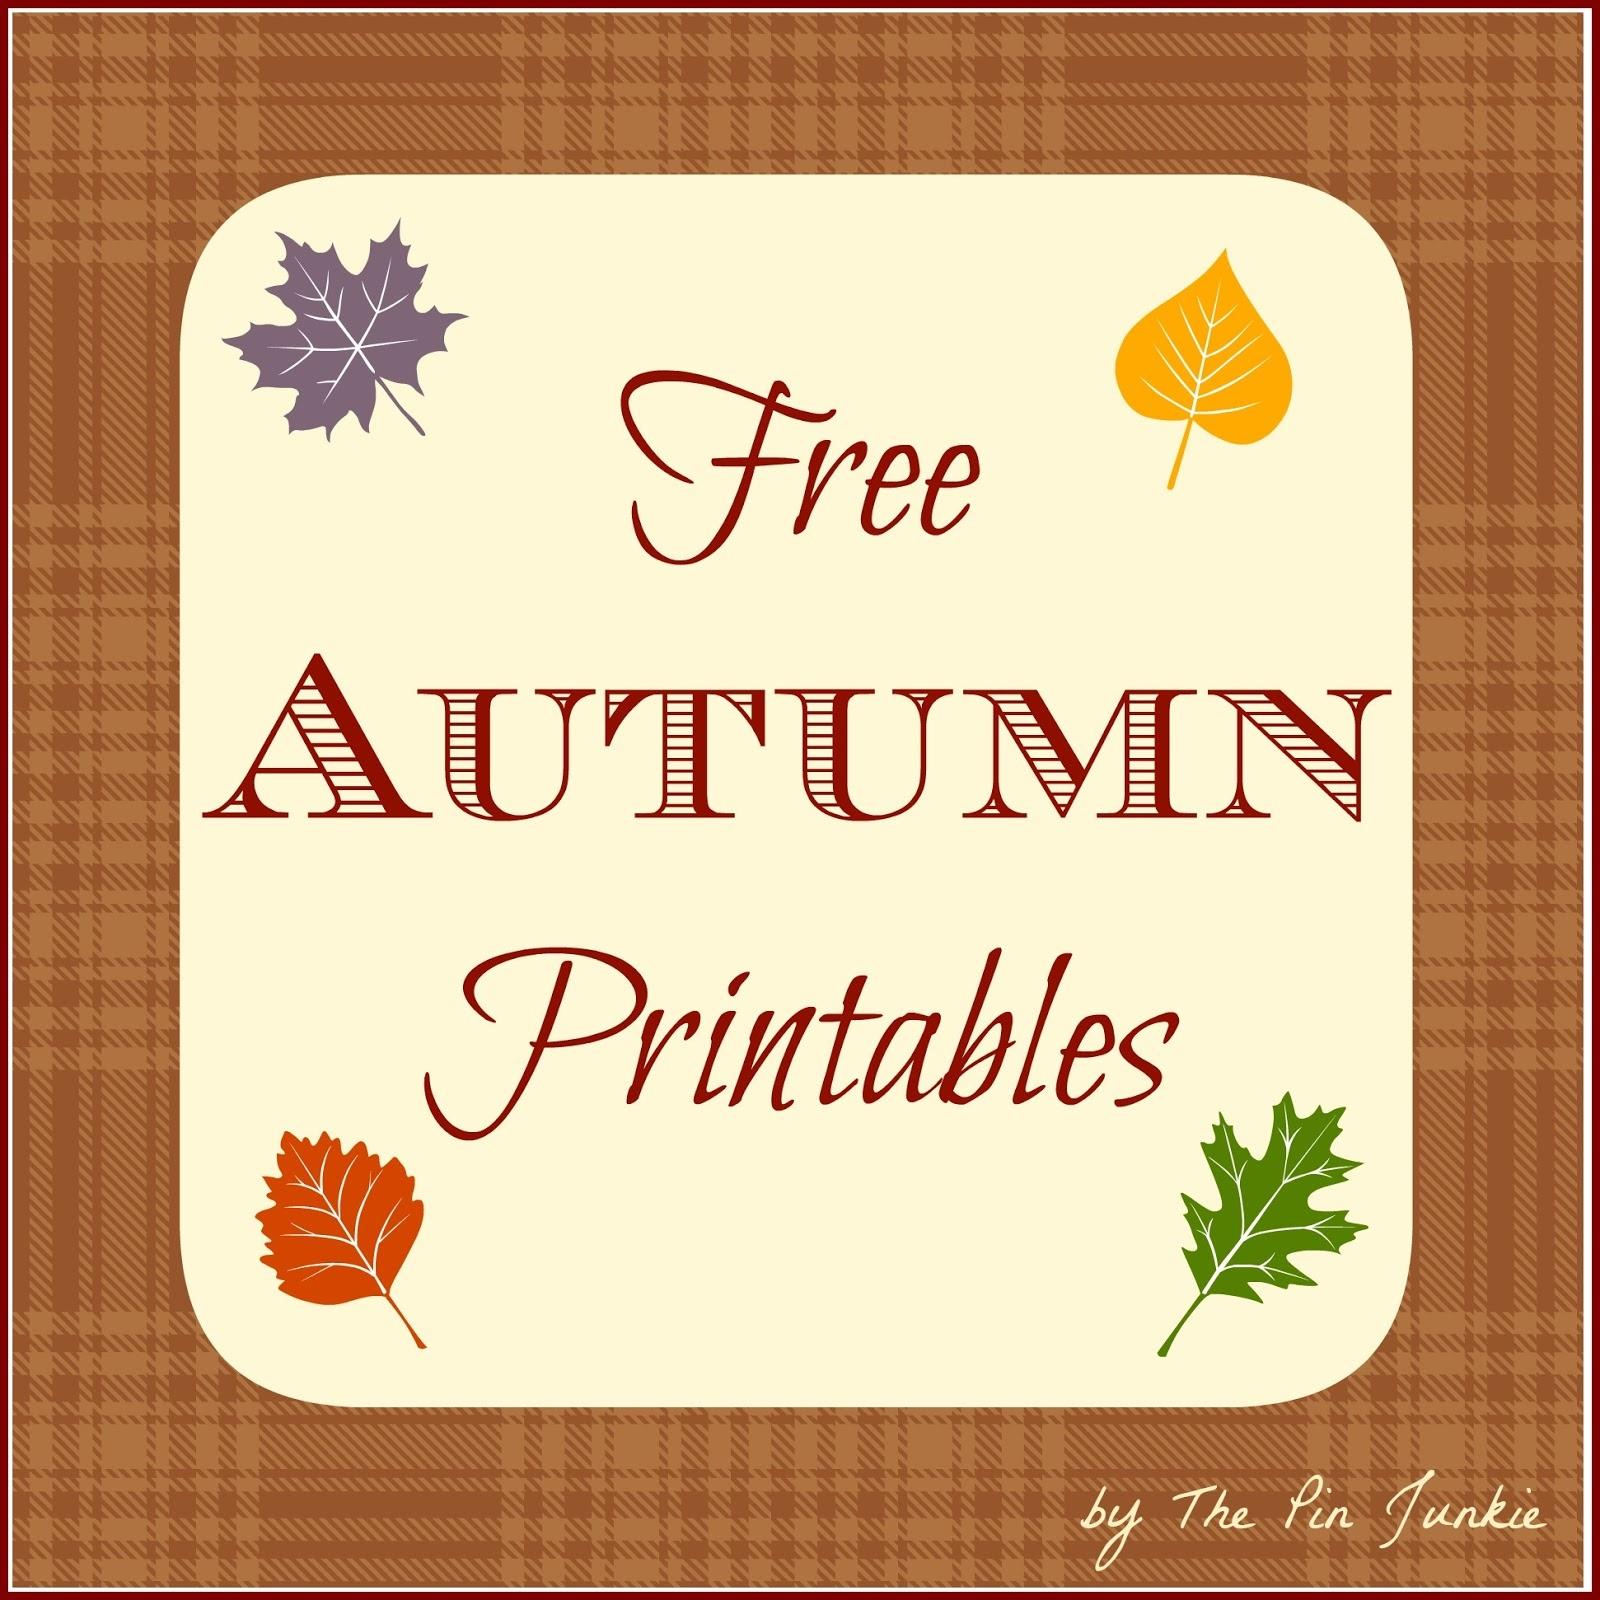 Free Autumn Printables - Free Autumn Printables